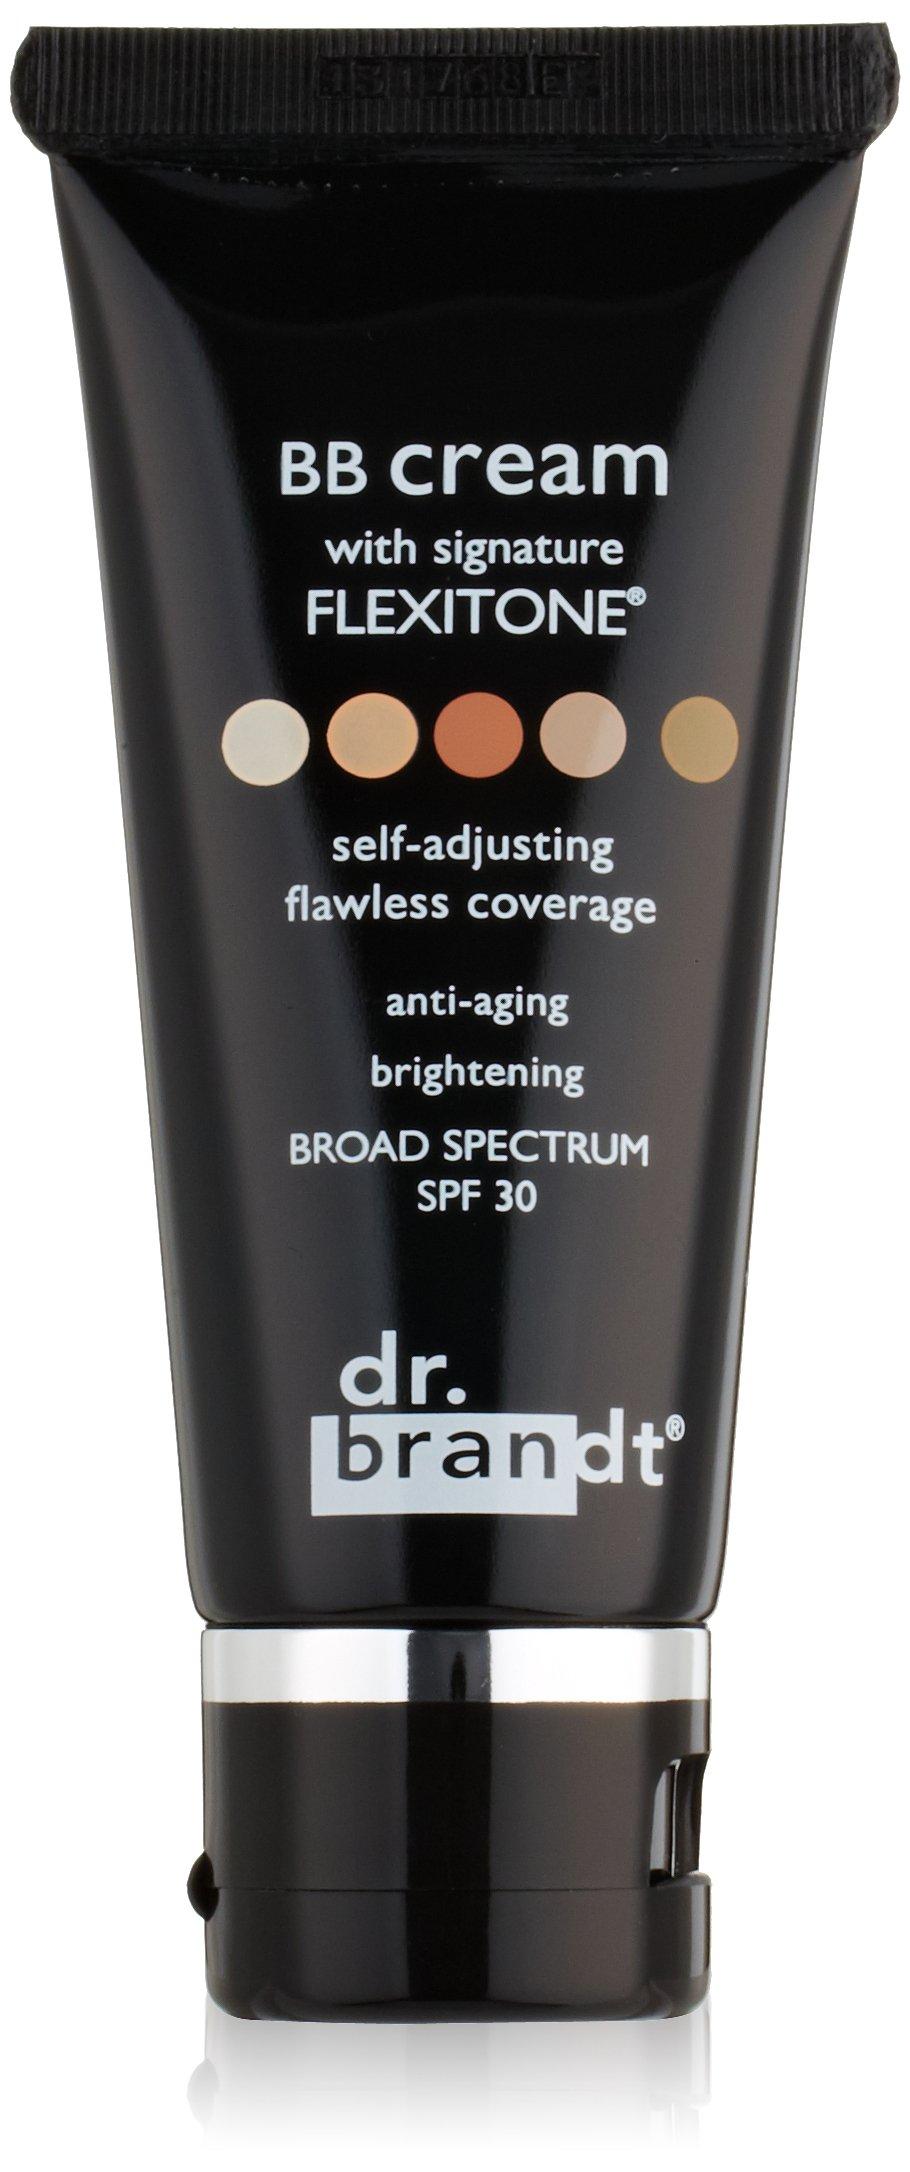 dr. brandt BB Cream with Signature FLEXITONE, 1 fl. oz.